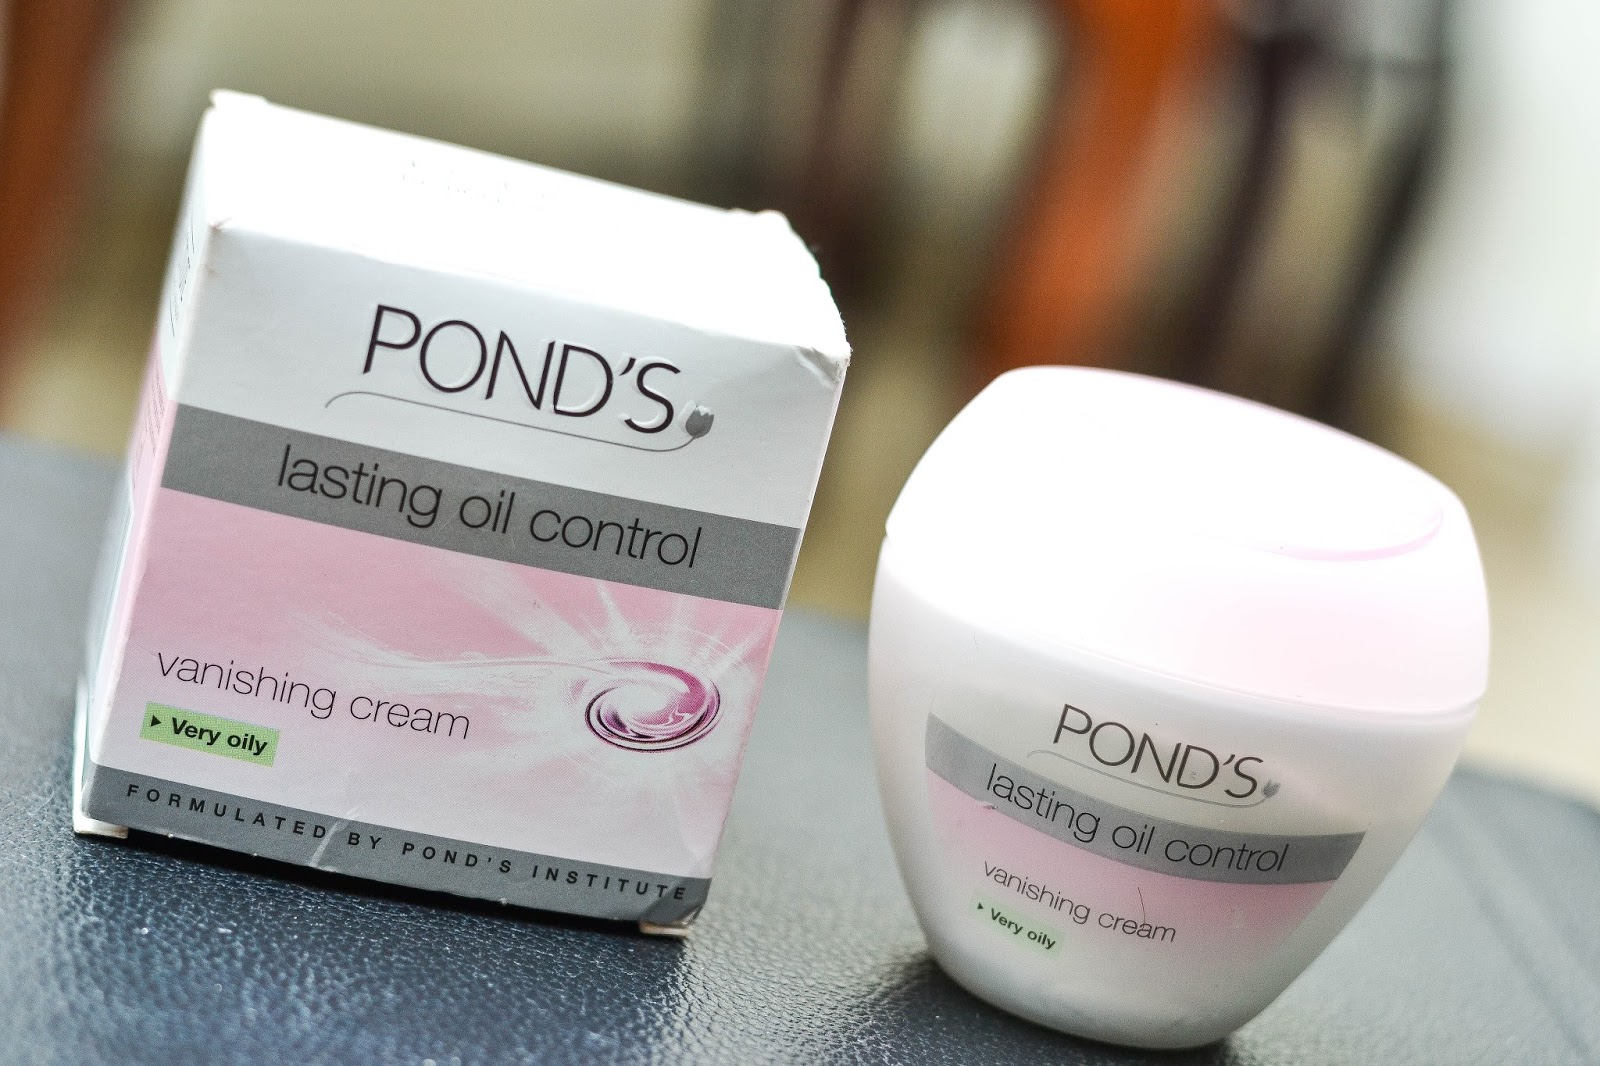 Primer from Ponds